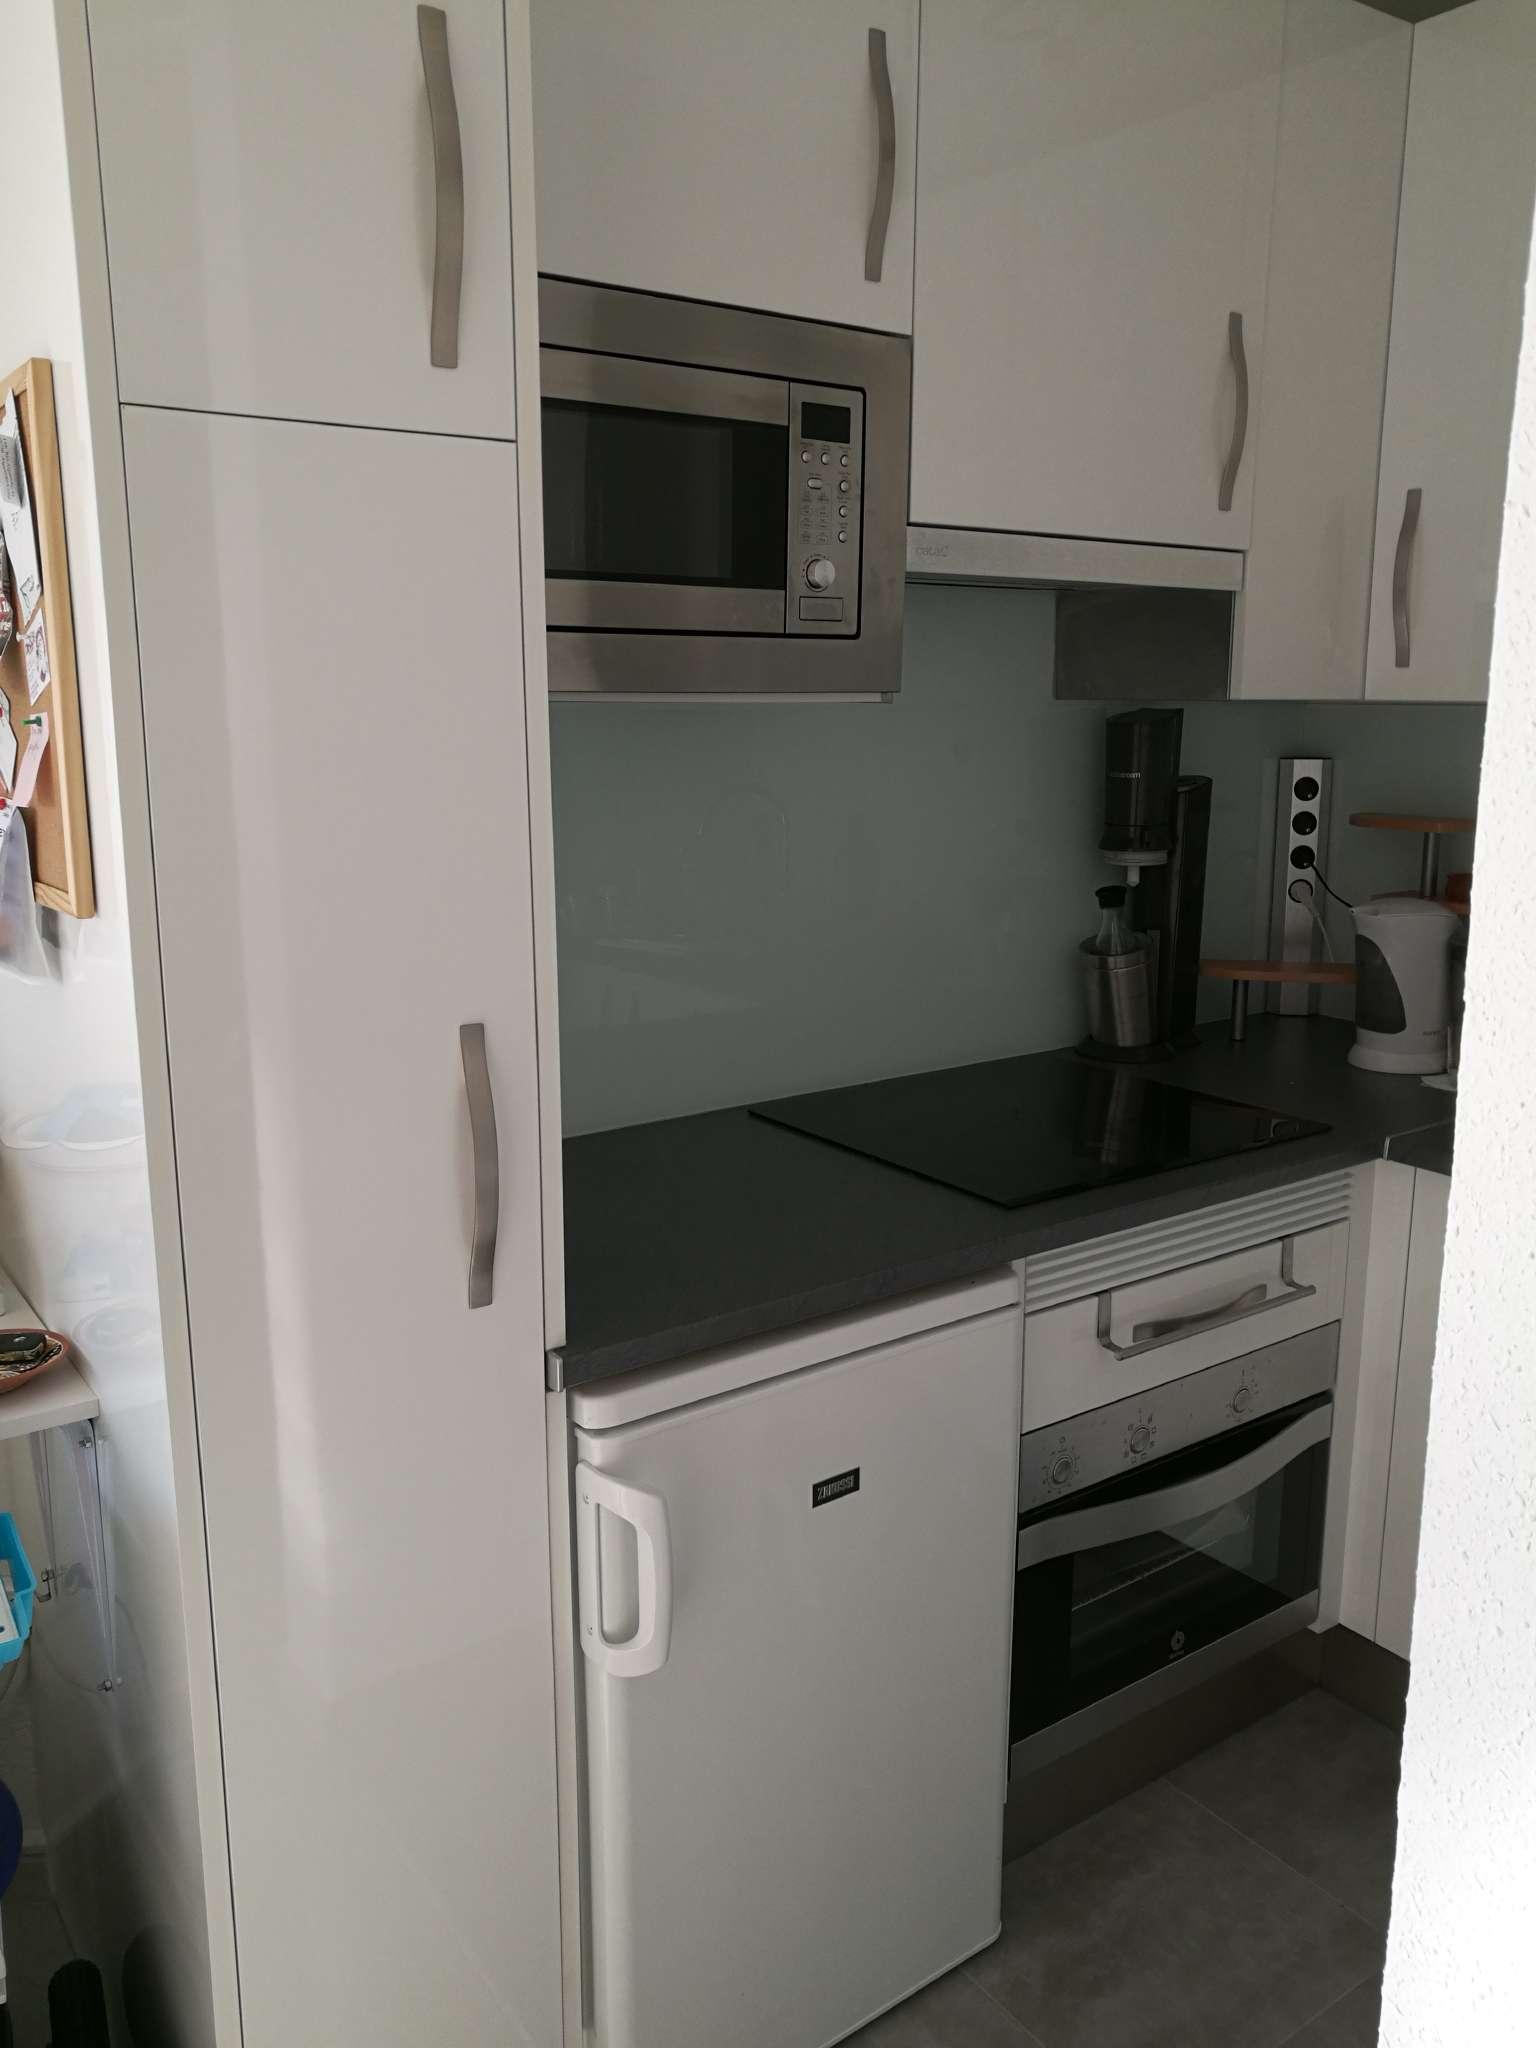 Küche (noch nicht rollstuhlgerecht)